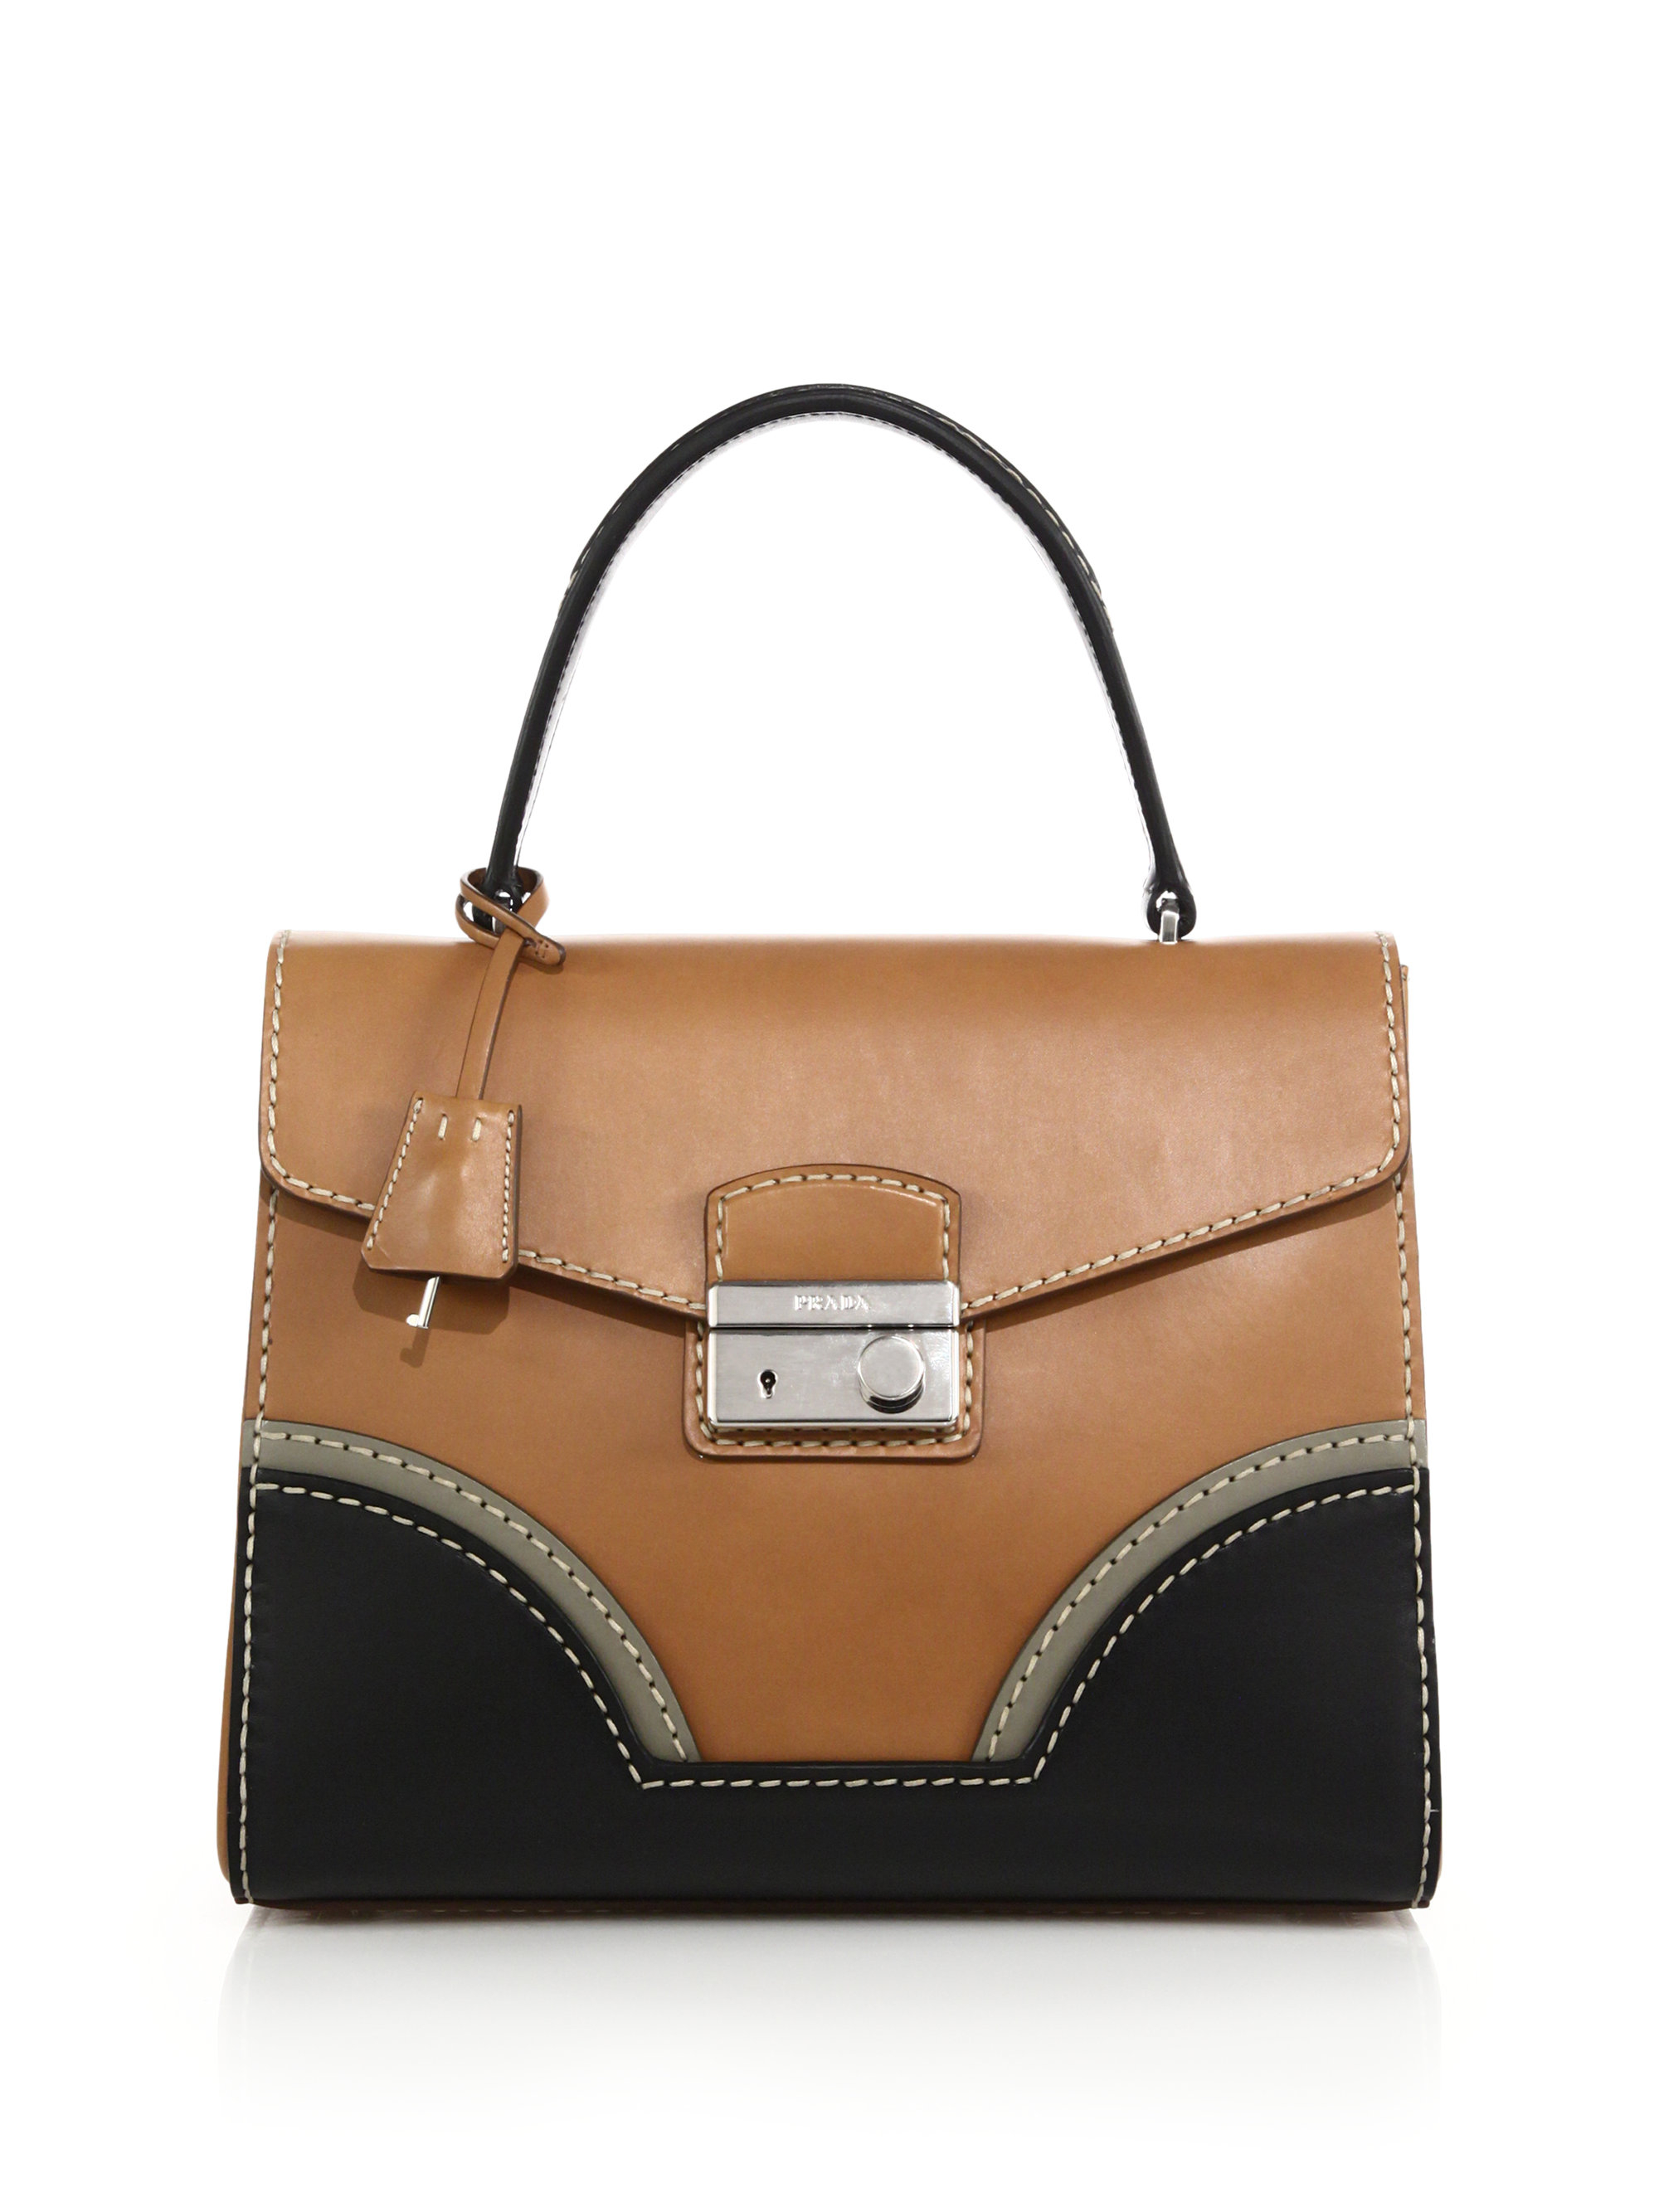 Lyst - Prada Calf Leather Top-handle Bag in Brown 6f15747bf4c3f